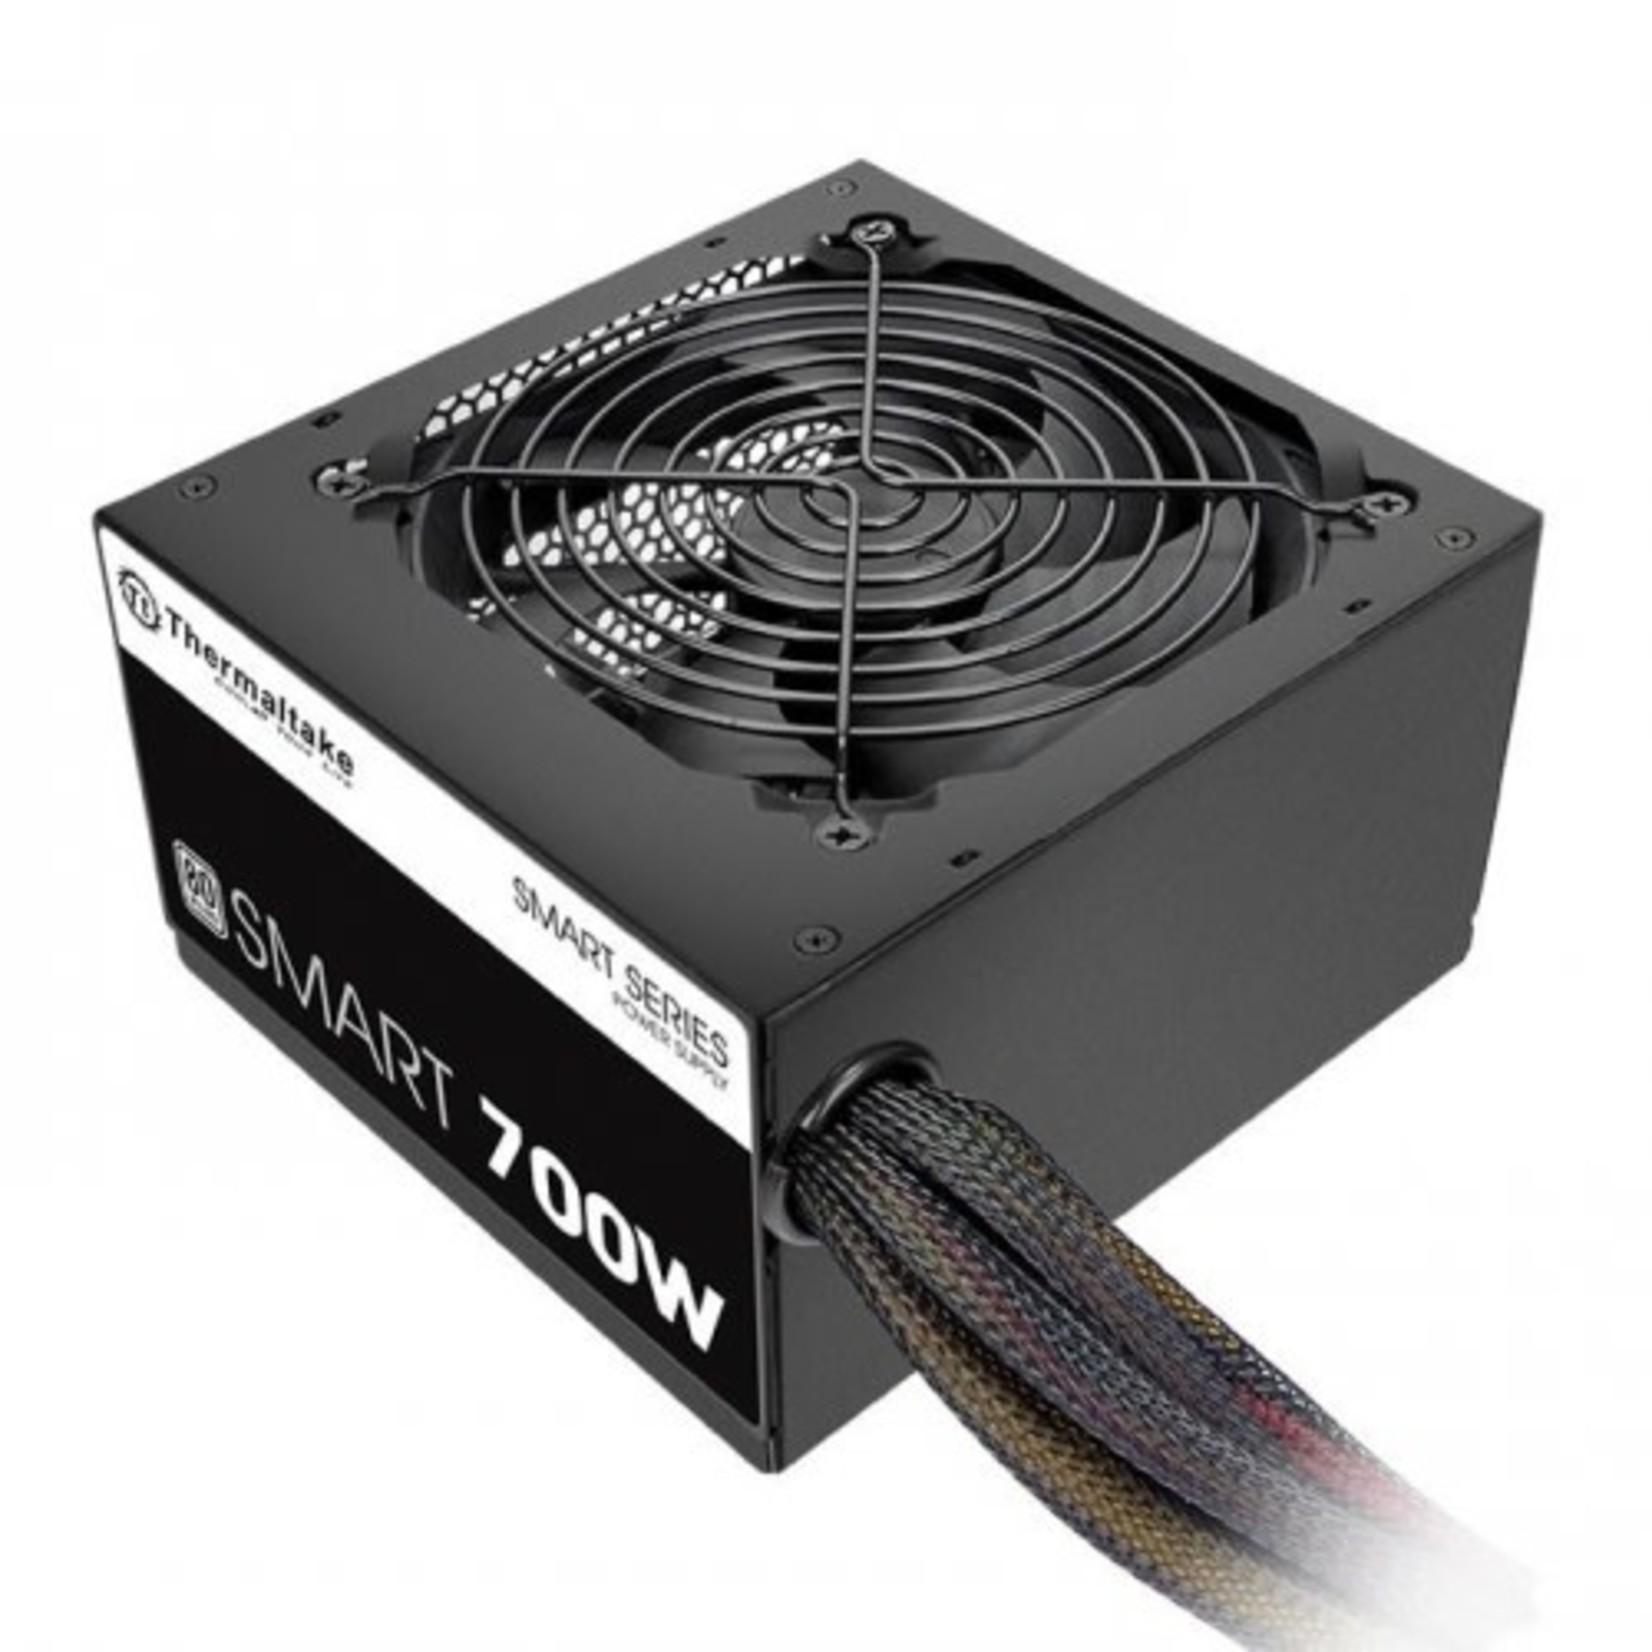 Thermaltake TT PS 700W 80+ Smart Power Supply